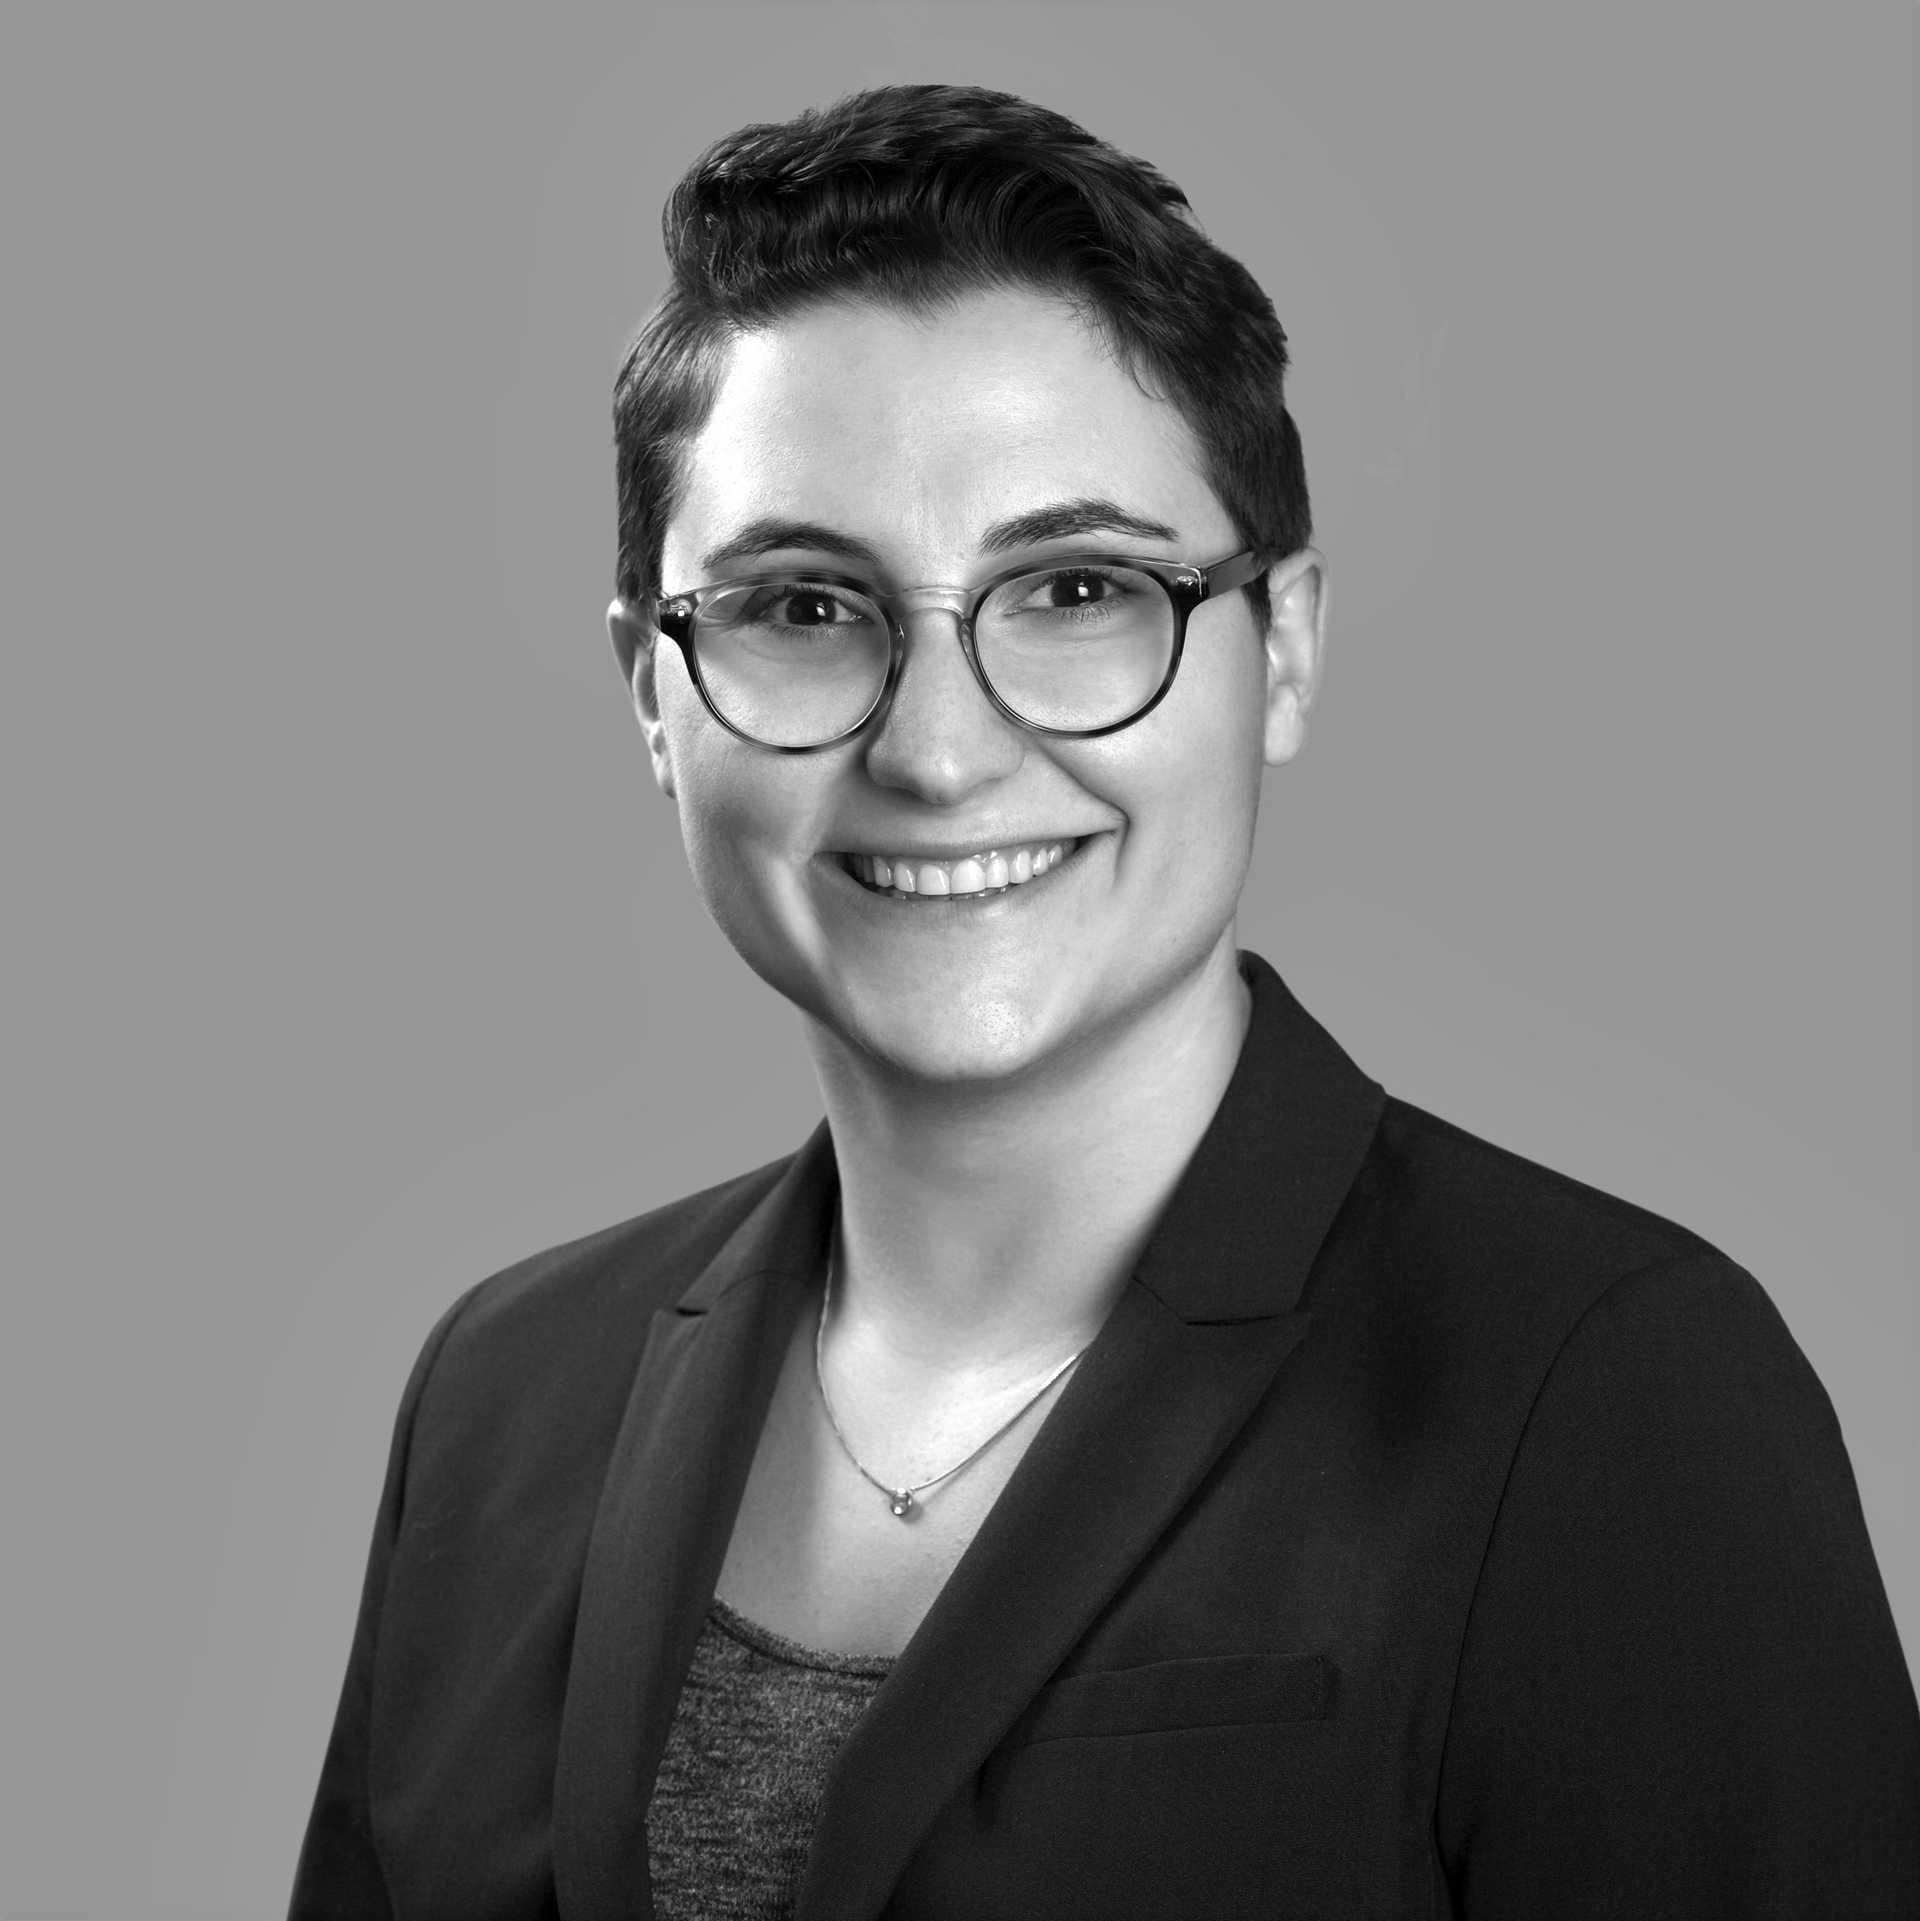 Marlin Hawk New York's Consultant Olivia Westbrook-Gold